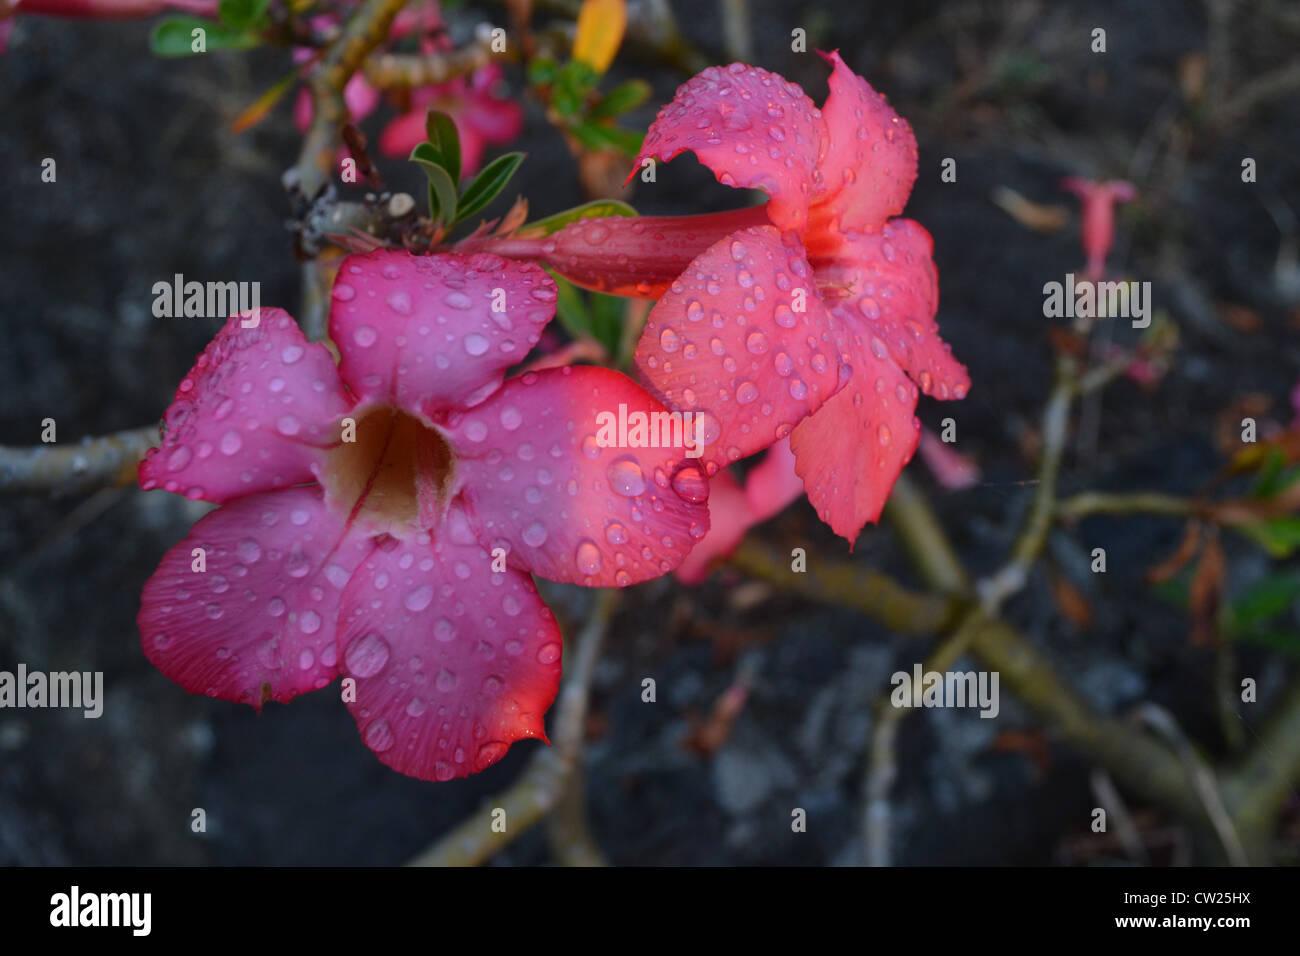 Hawaiian flower stock photos hawaiian flower stock images alamy blooming hawaiian flower drying off after an evening rain stock image izmirmasajfo